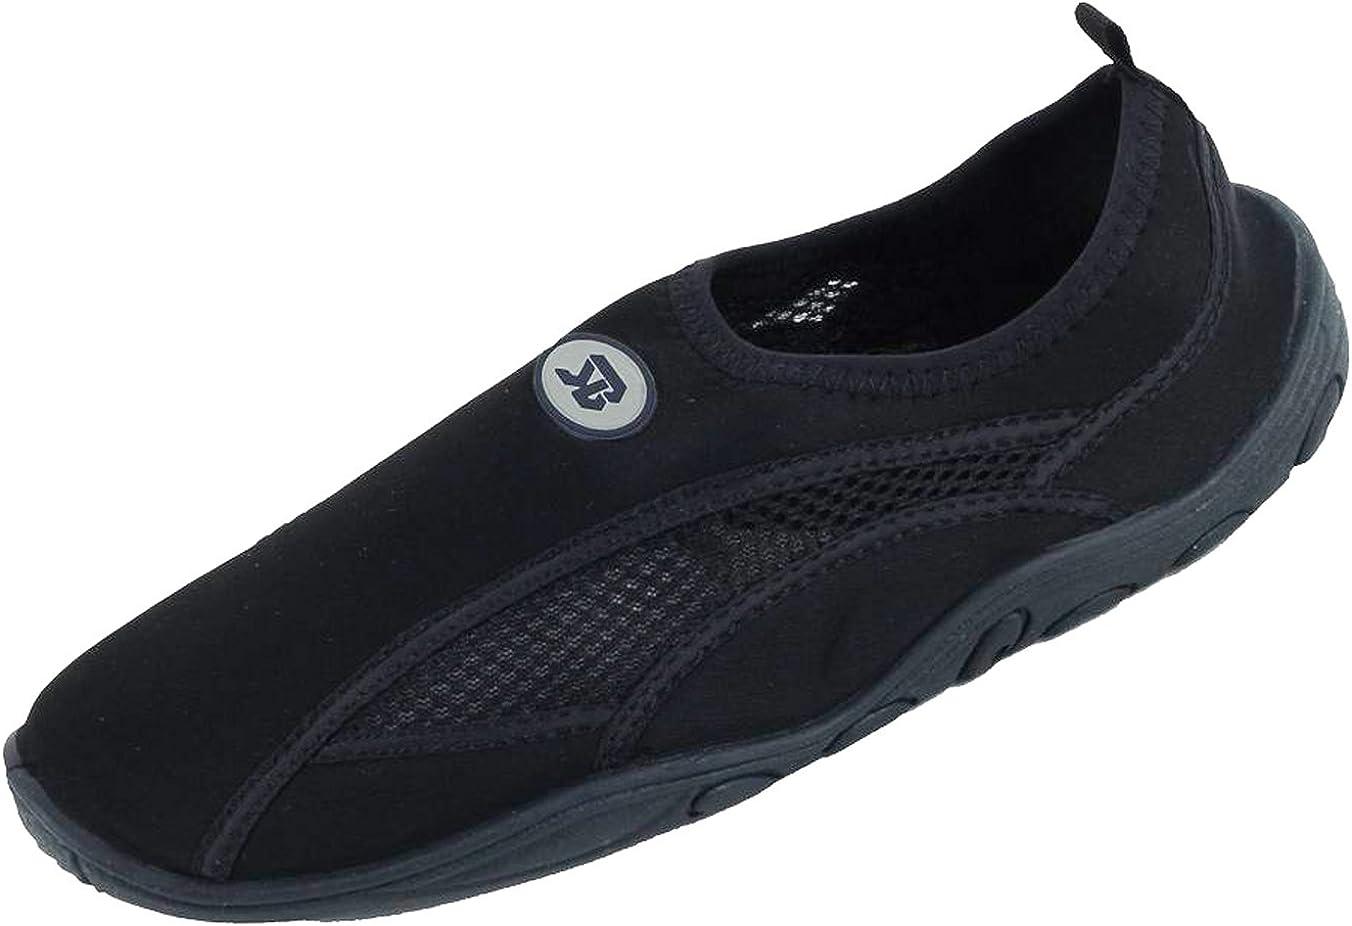 SV S5909 Men's Water Shoes Aqua Colors Athletic on Max 76% OFF Max 65% OFF Slip Socks 4